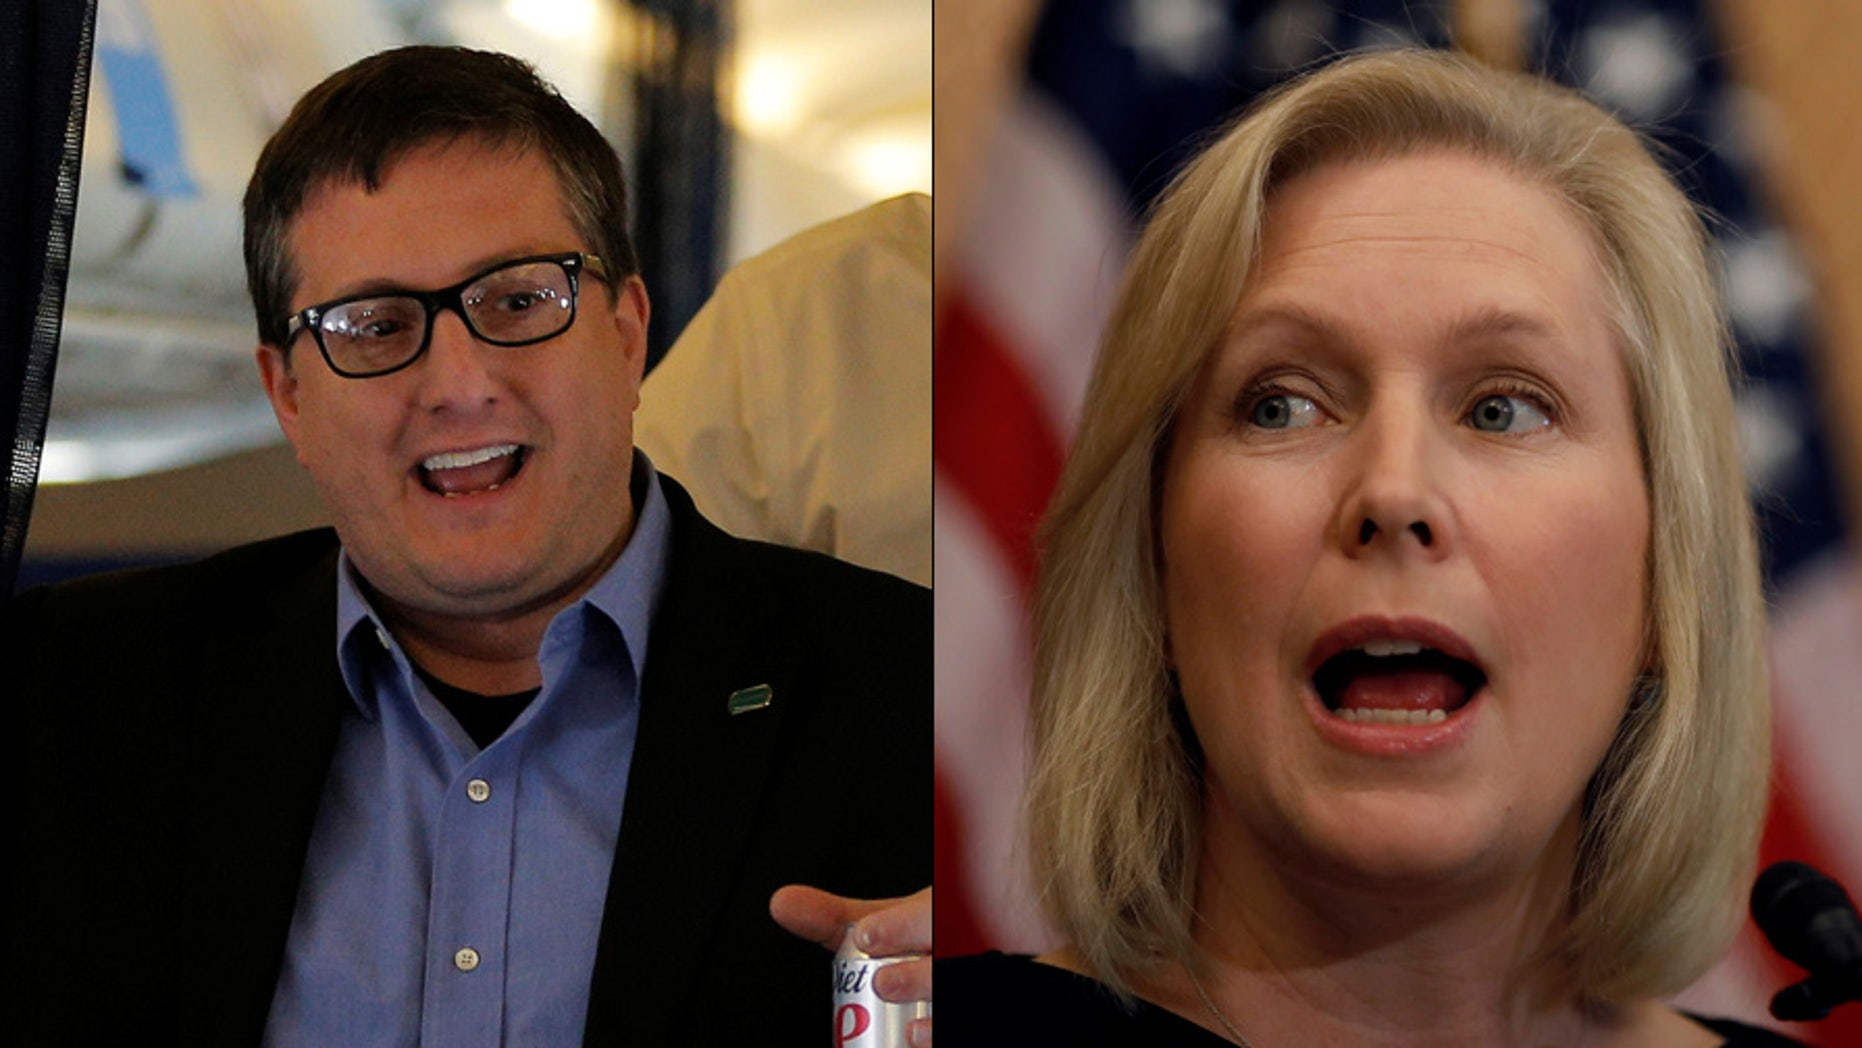 Philippe Reines, left, is not happy with Sen. Kirsten Gillibrand's criticism of Bill Clinton.